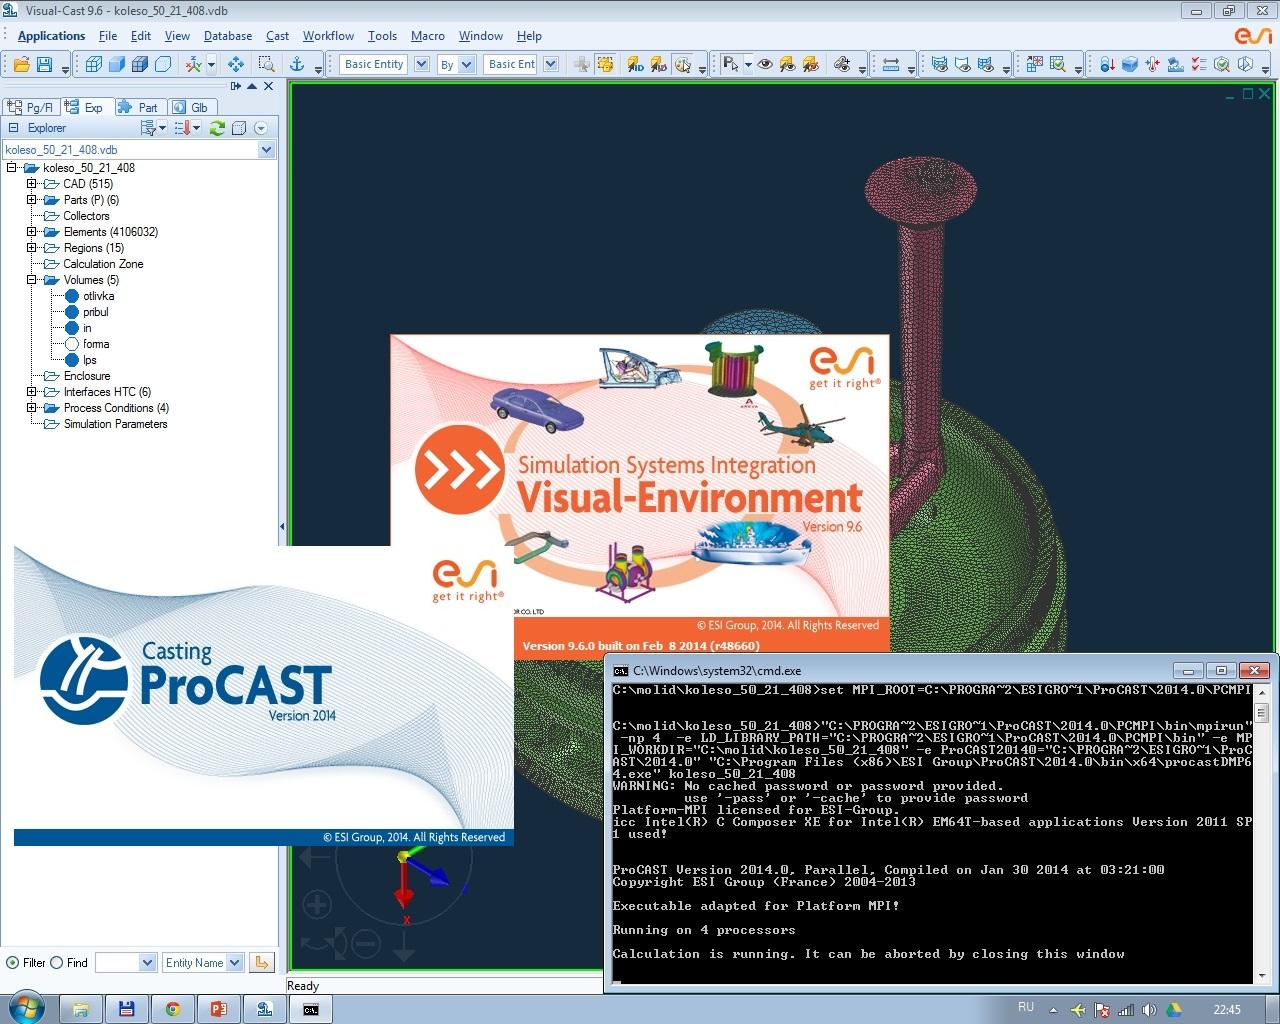 Working with ESI ProCAST v2014.0 + Visual-Environment v9.6 full license